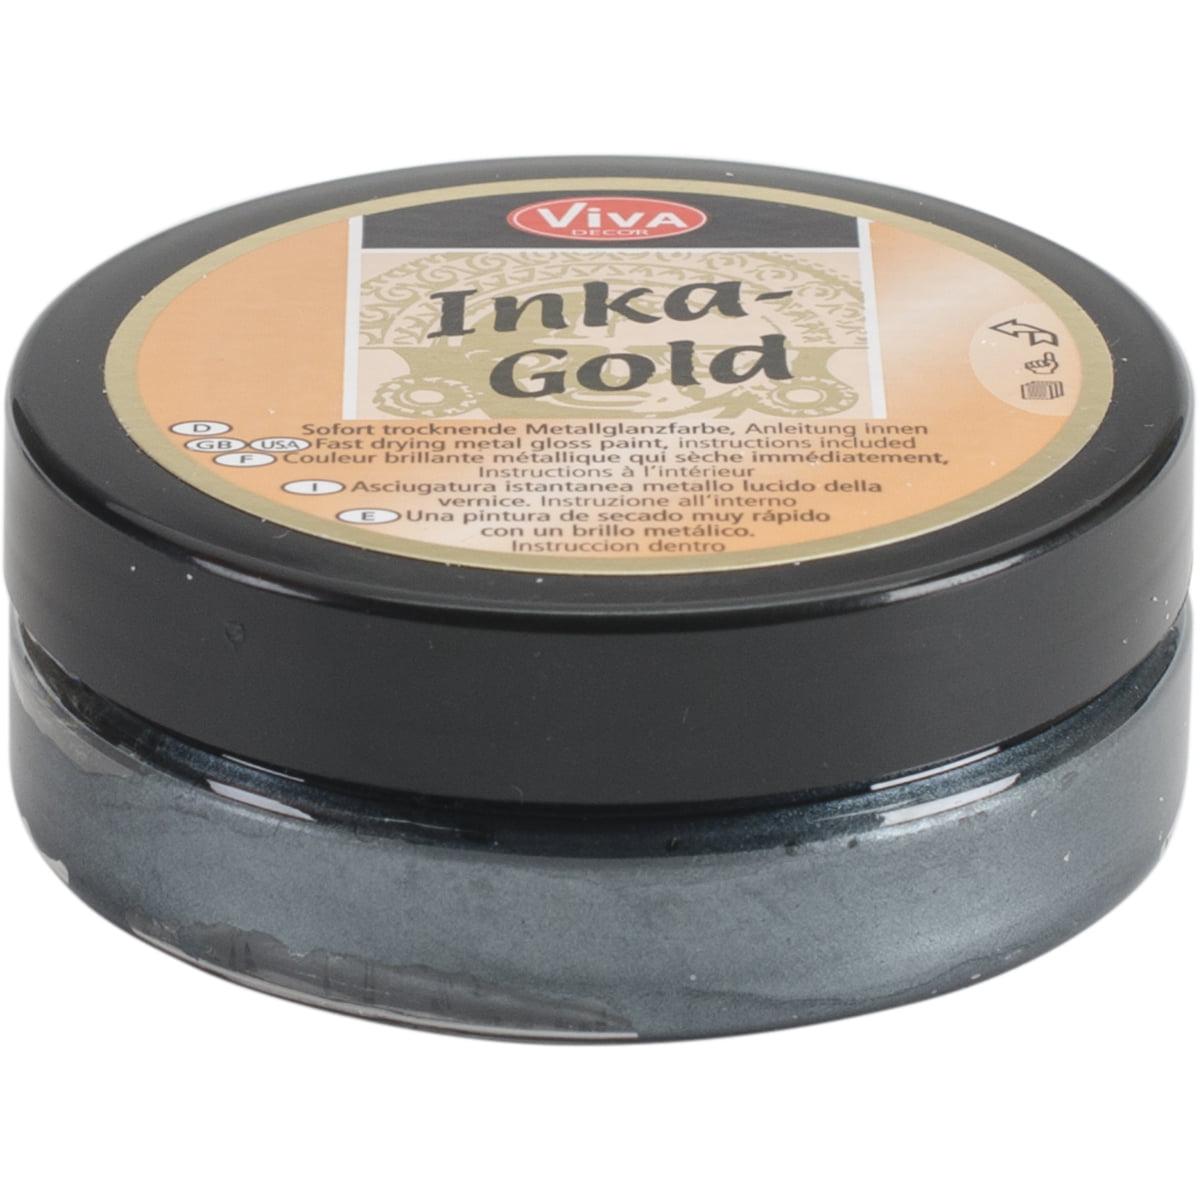 Viva Decor 62.5gm Inka Gold Metal Gloss Paint, Gold